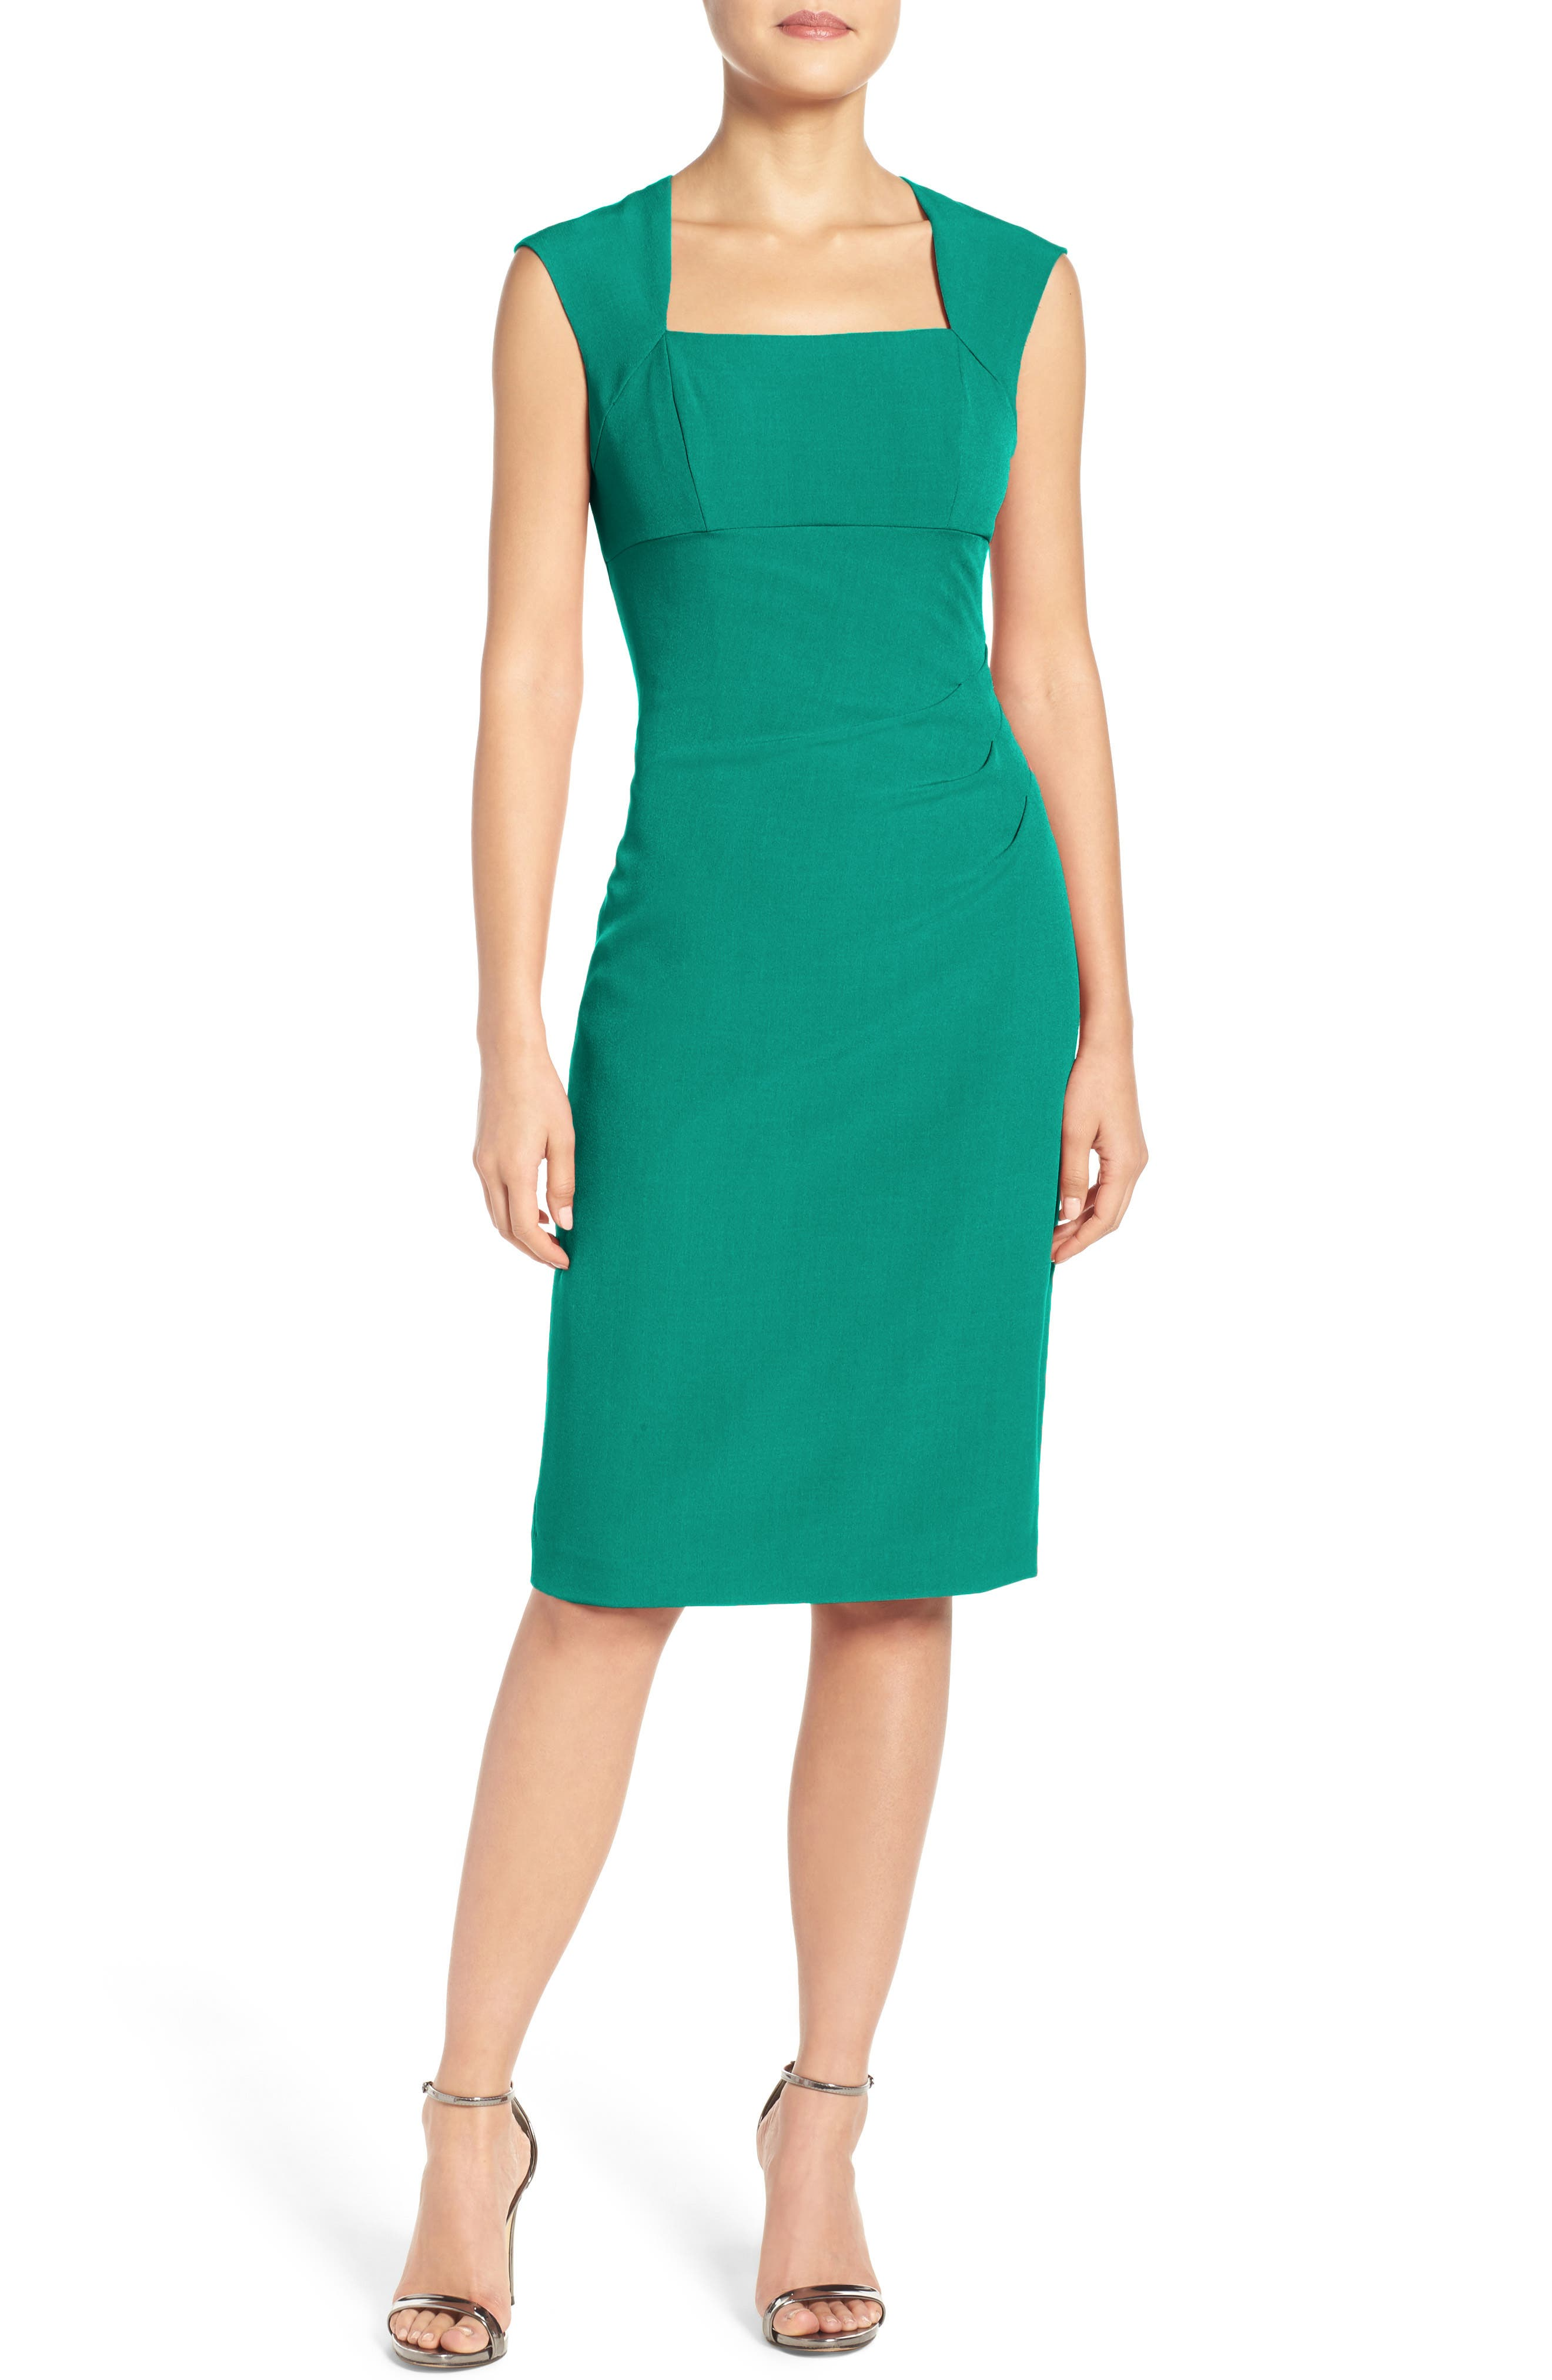 Alternate Image 1 Selected - Adrianna Papell Pleated Sheath Dress